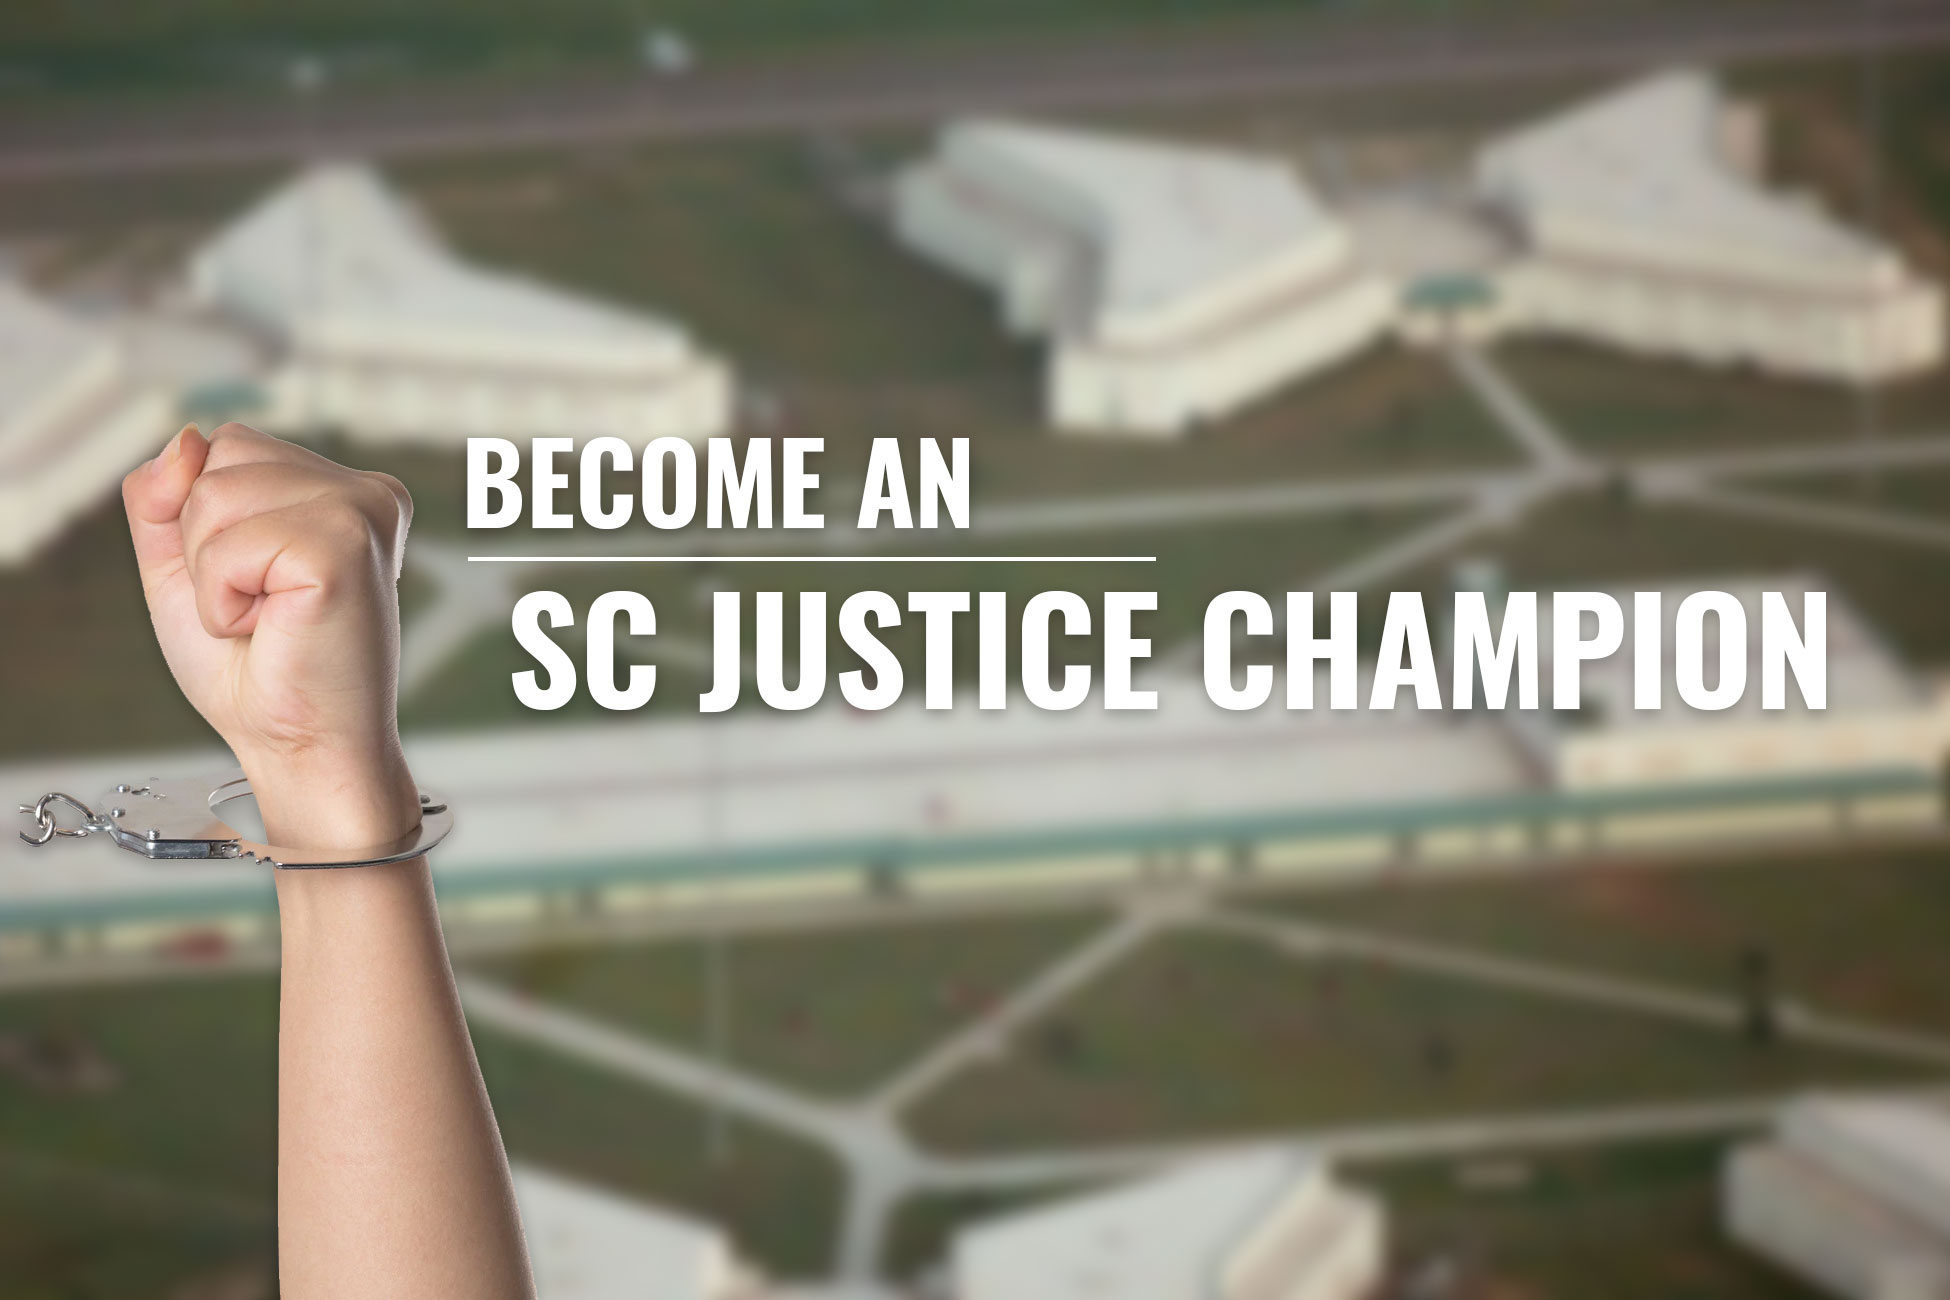 Sc-justice-champion